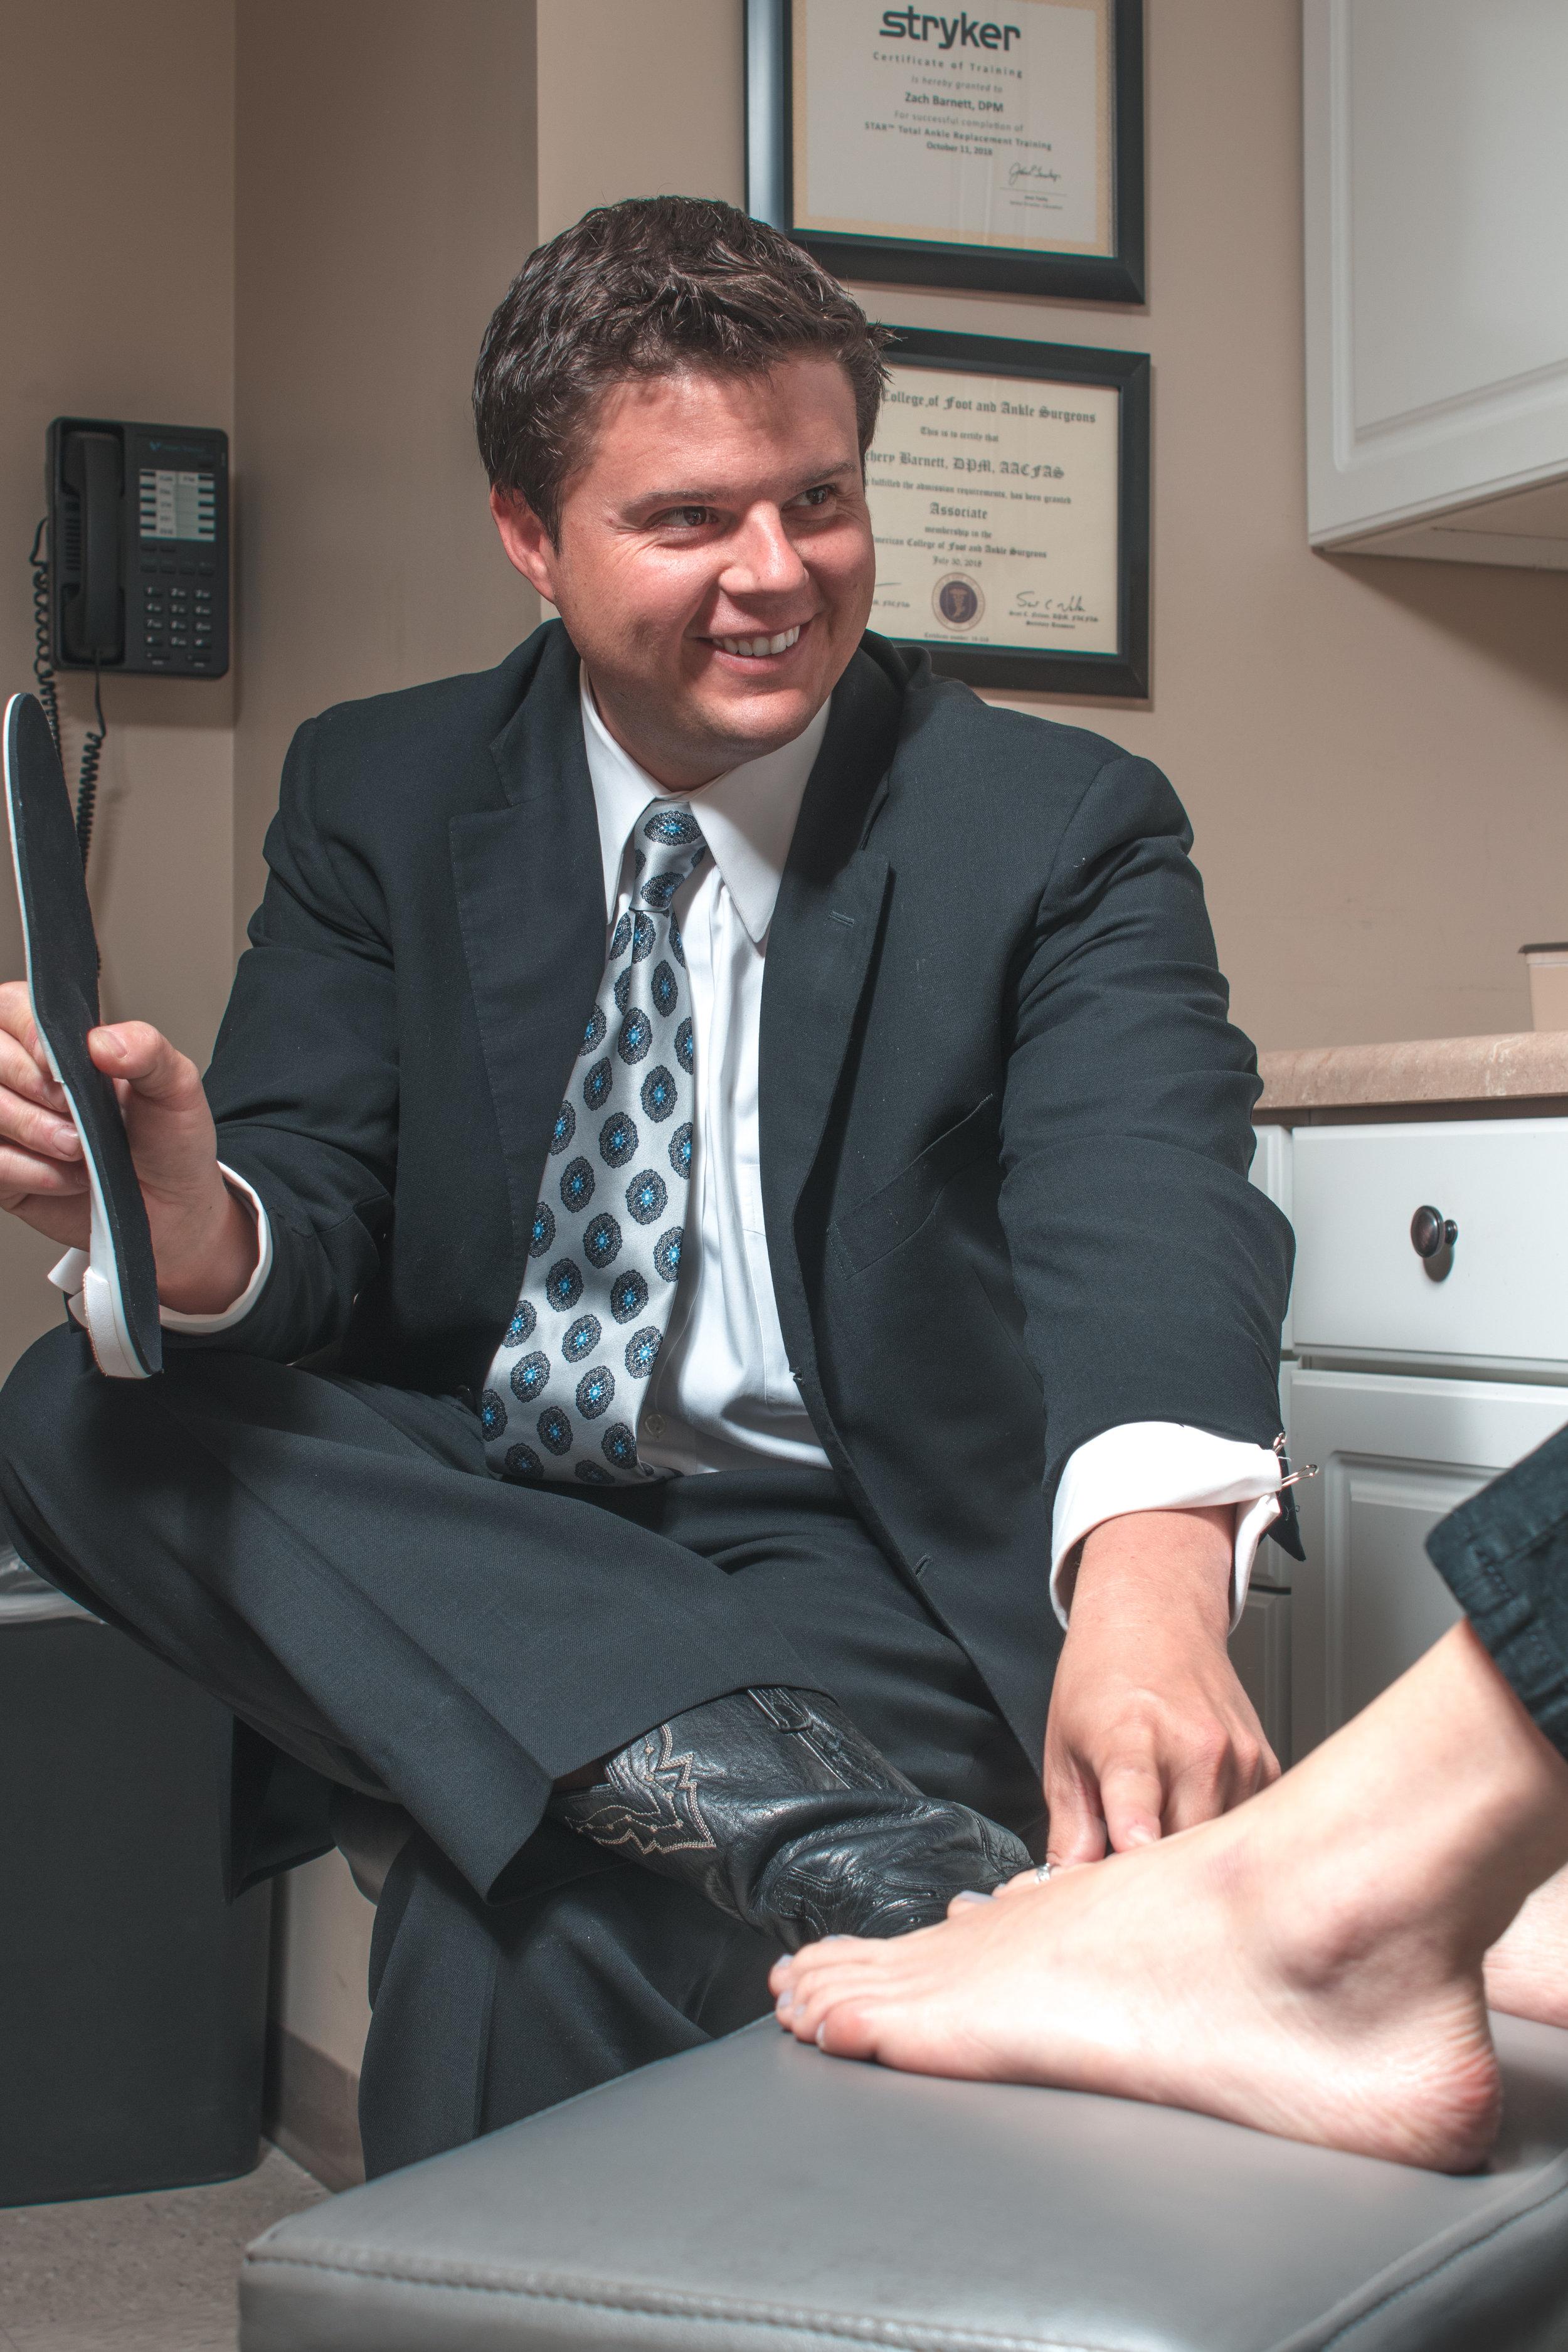 foot pain specialist zachery barnett, tampa fl